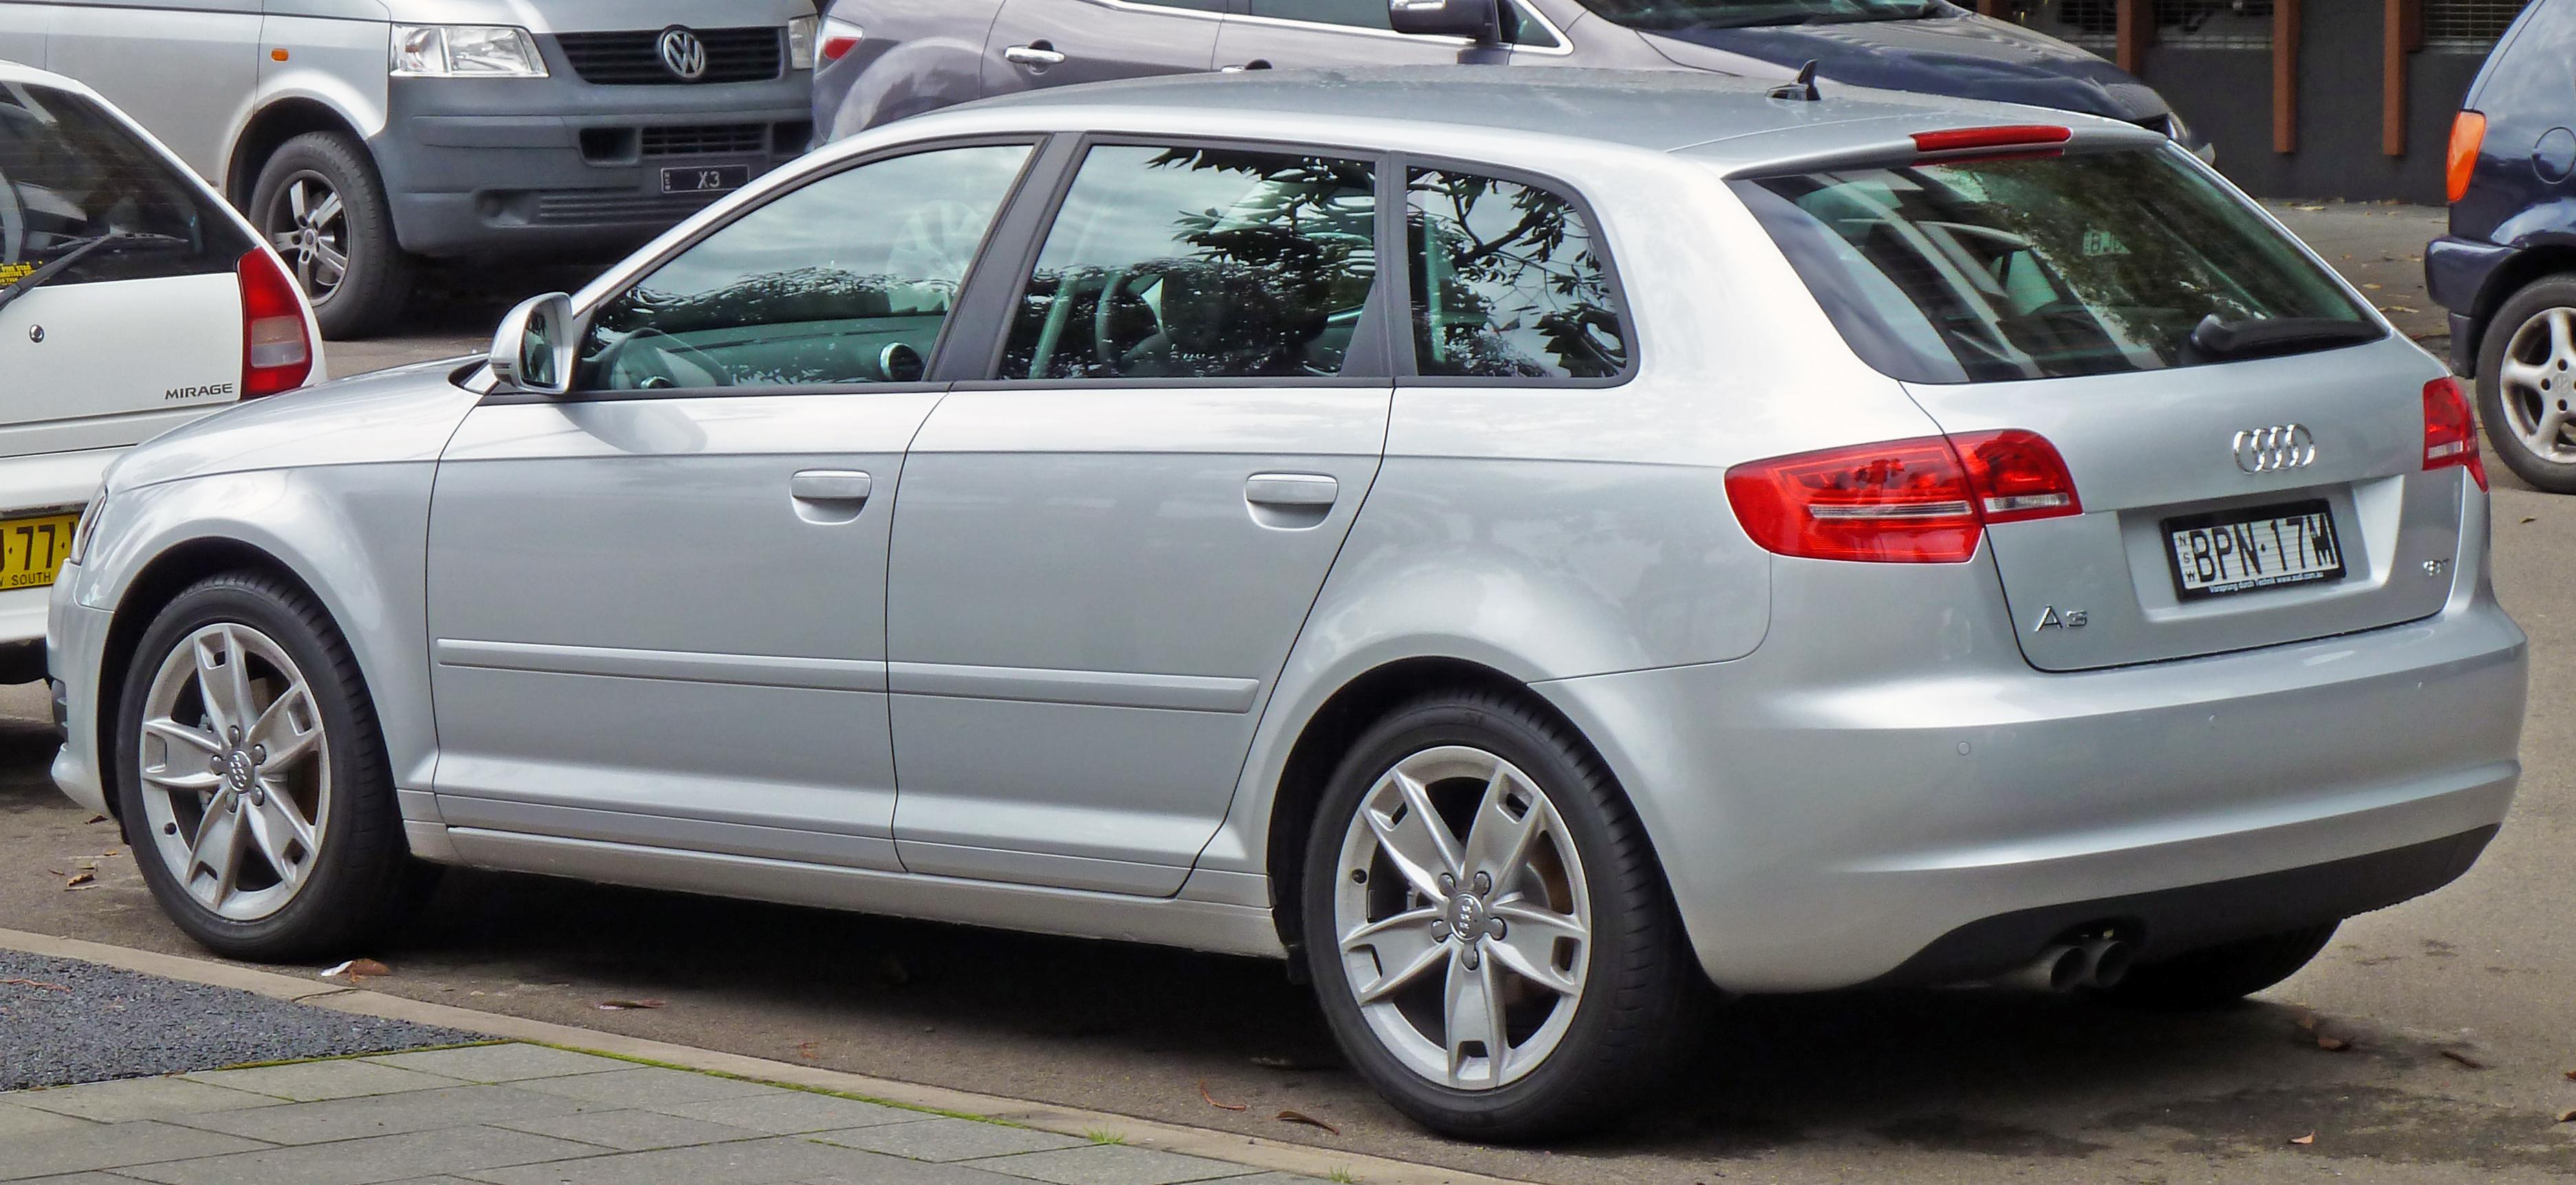 2009 Audi A3 Image 12